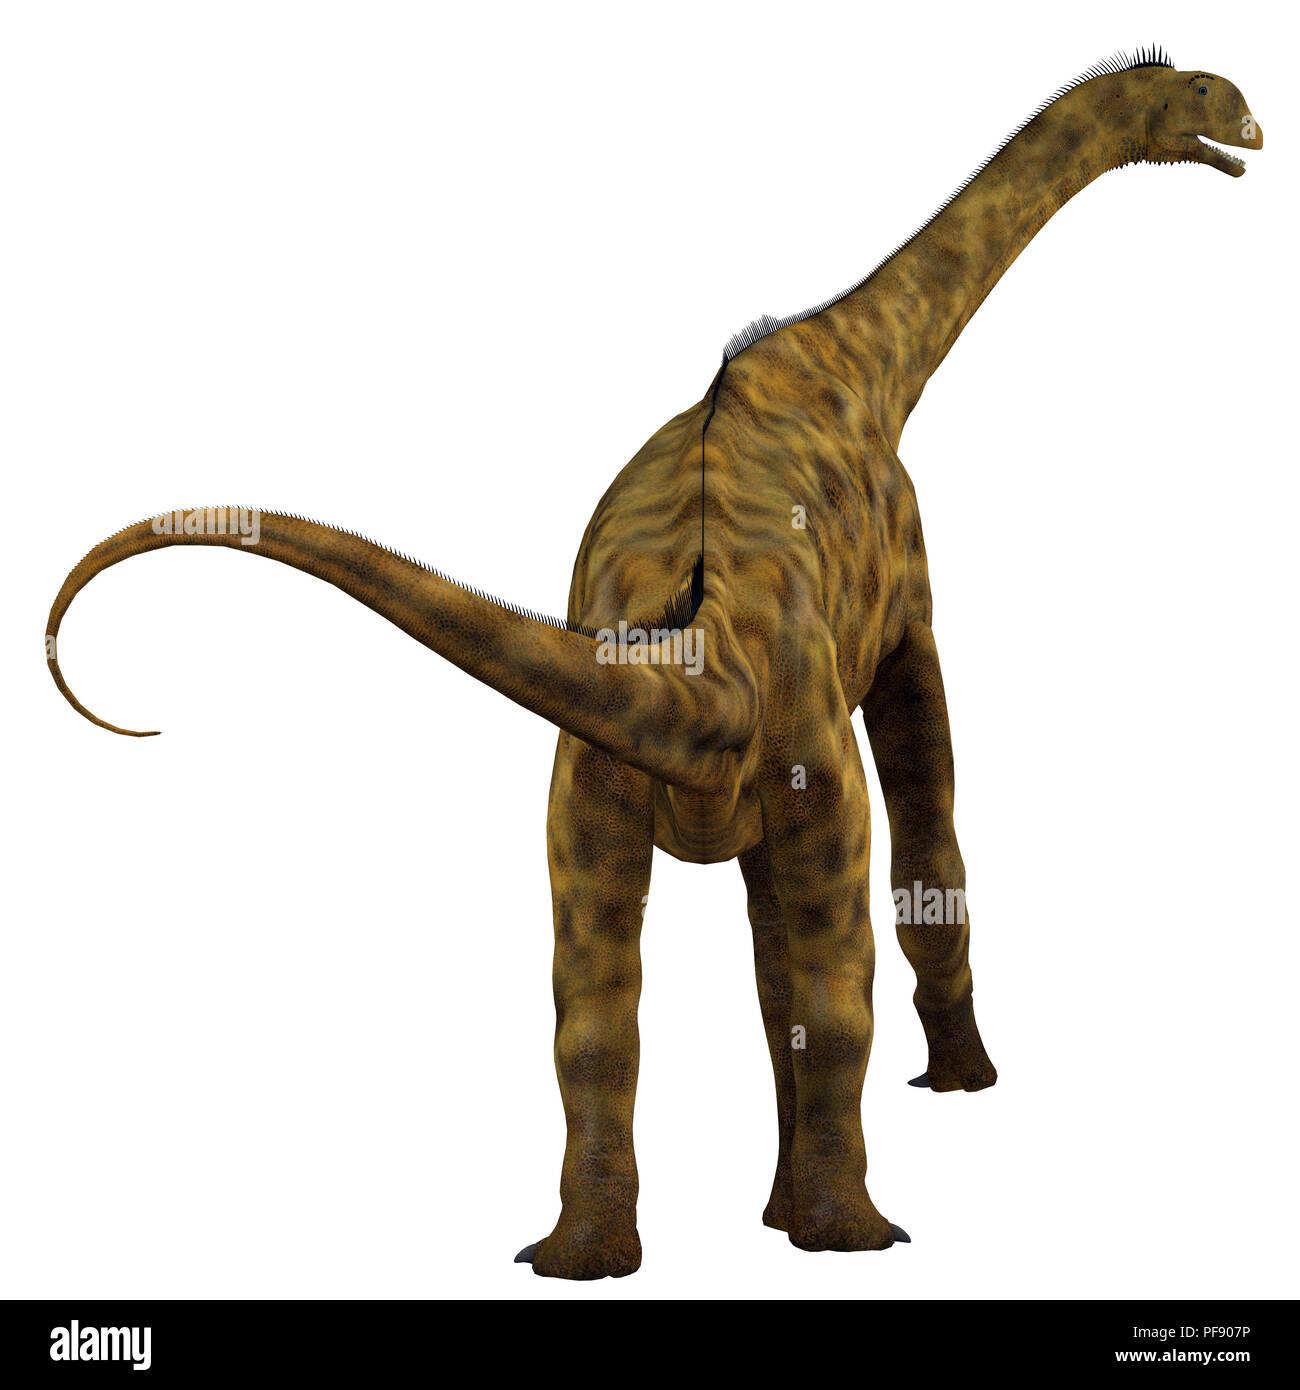 Atlasaurus Dinosaur - Atlasaurus was a herbivorous sauropod dinosaur that lived in Morocco, North Africa during the Jurassic Period. - Stock Image